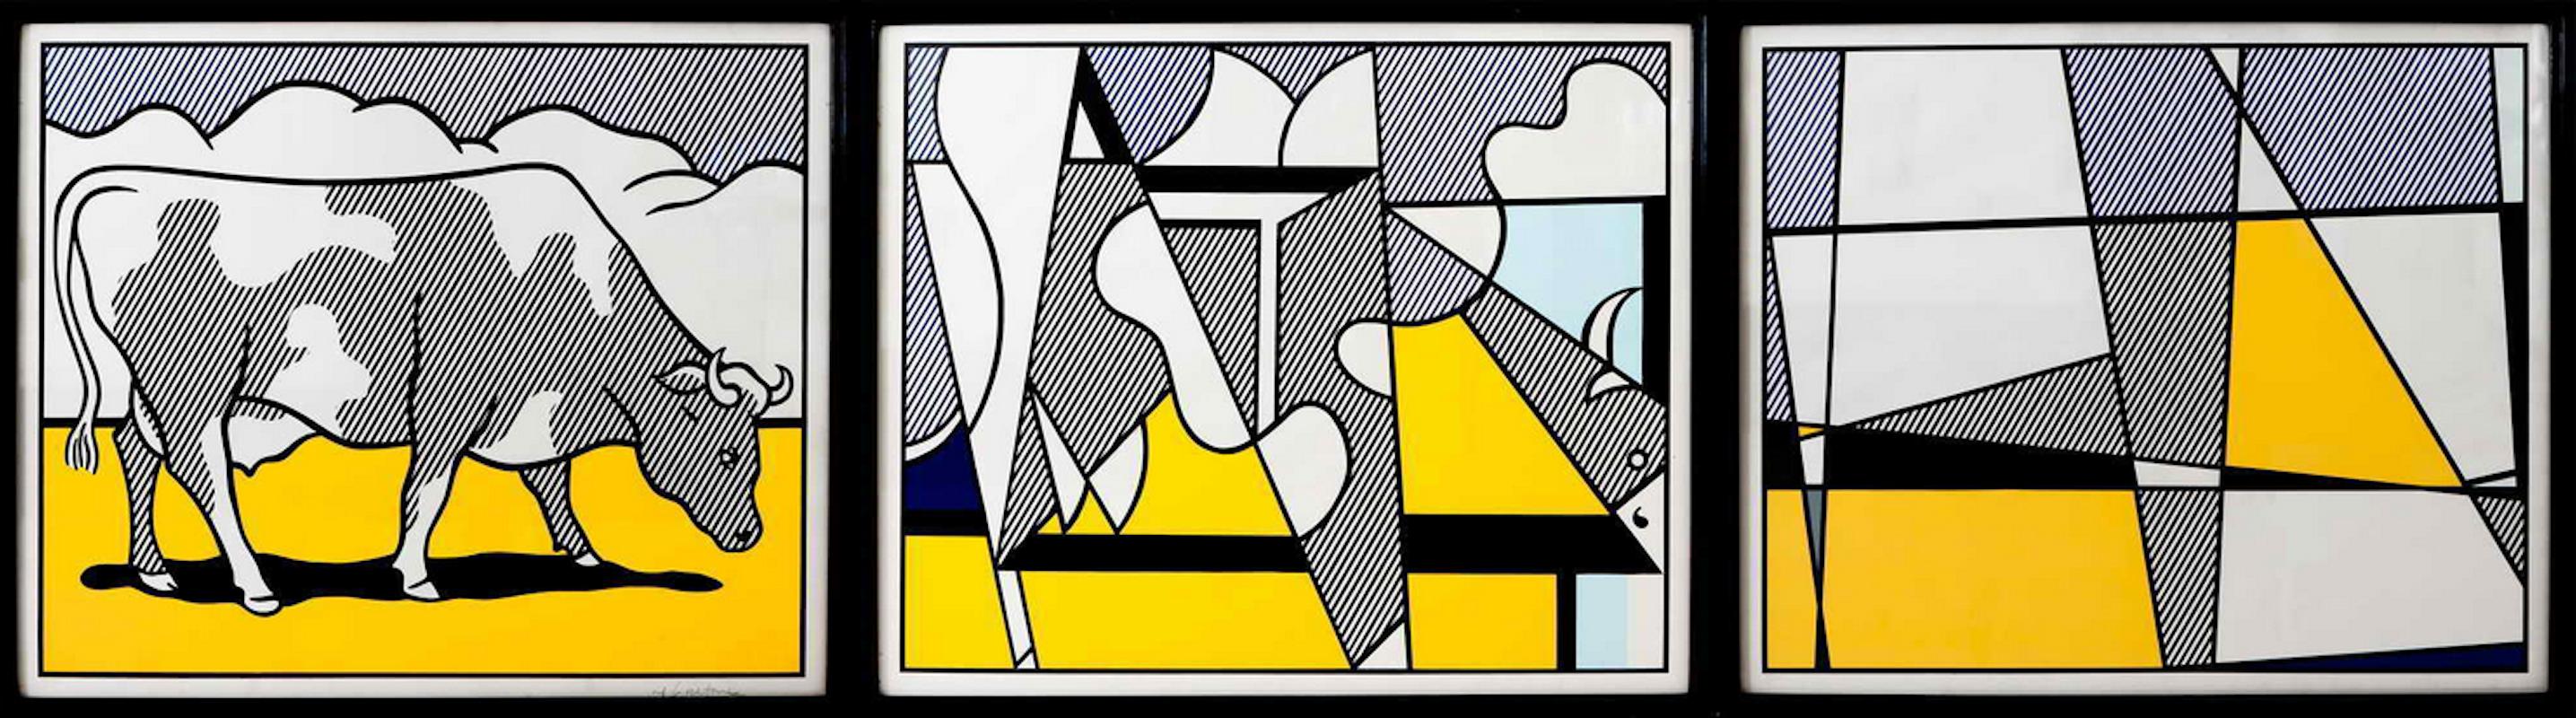 Cow Going Abstract by Roy Lichtenstein